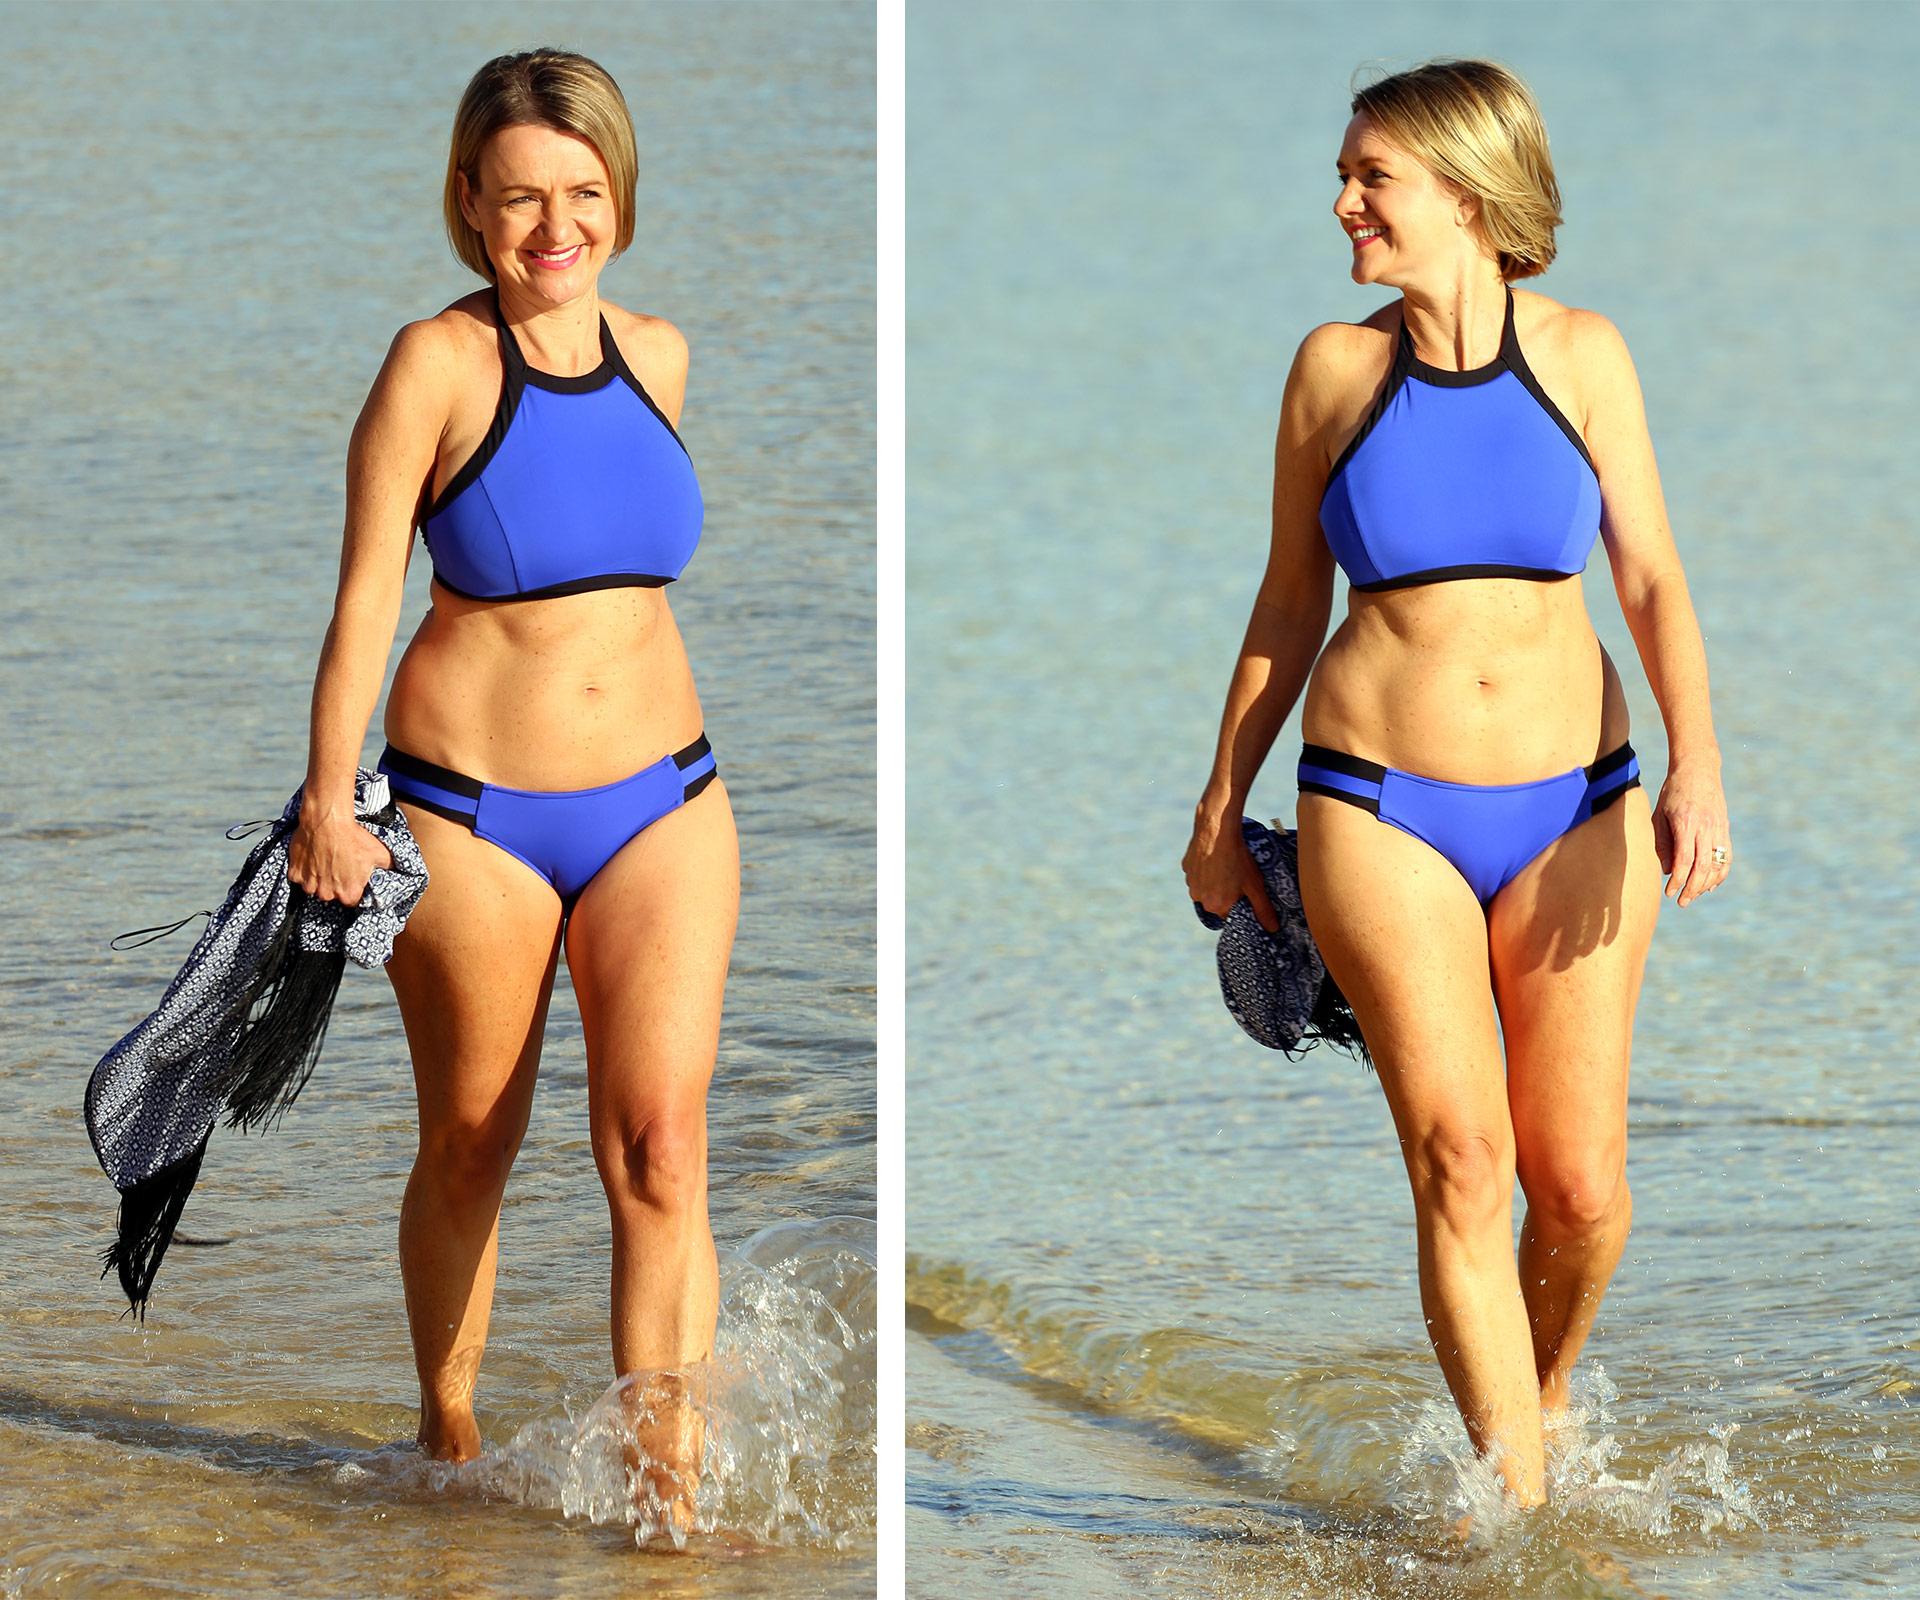 MKR's Jac and Shaz show off their bikini bodies | Woman's Day